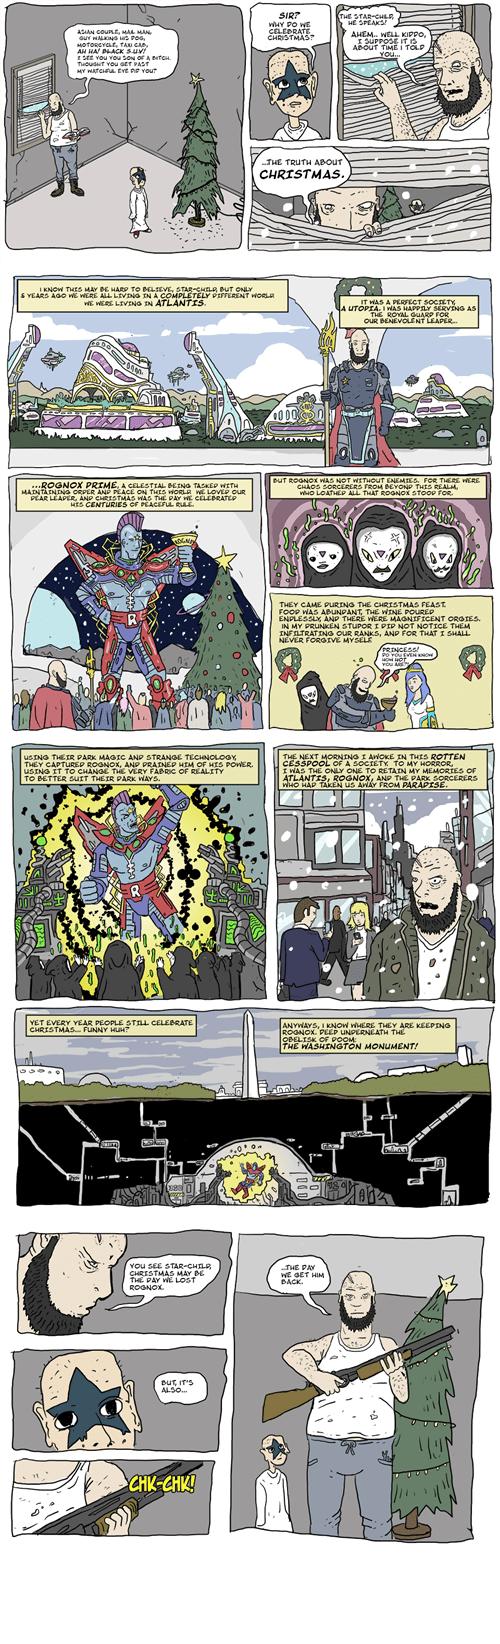 atlantis,christmas,mindwarp,wtf,web comics